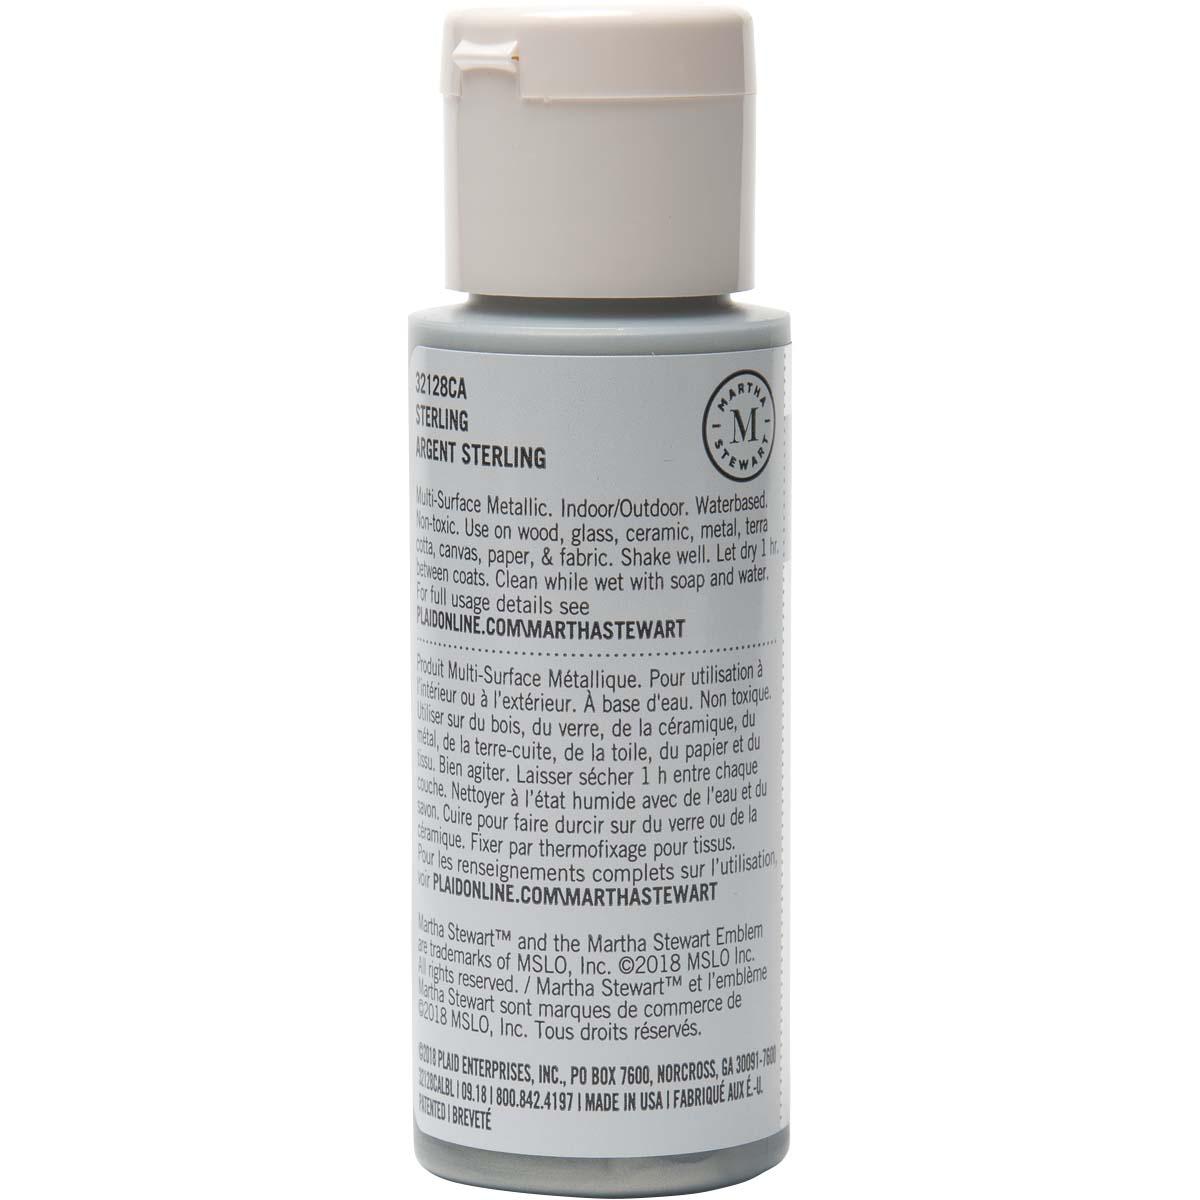 Martha Stewart® 2oz Multi-Surface Metallic Acrylic Craft Paint - Sterling